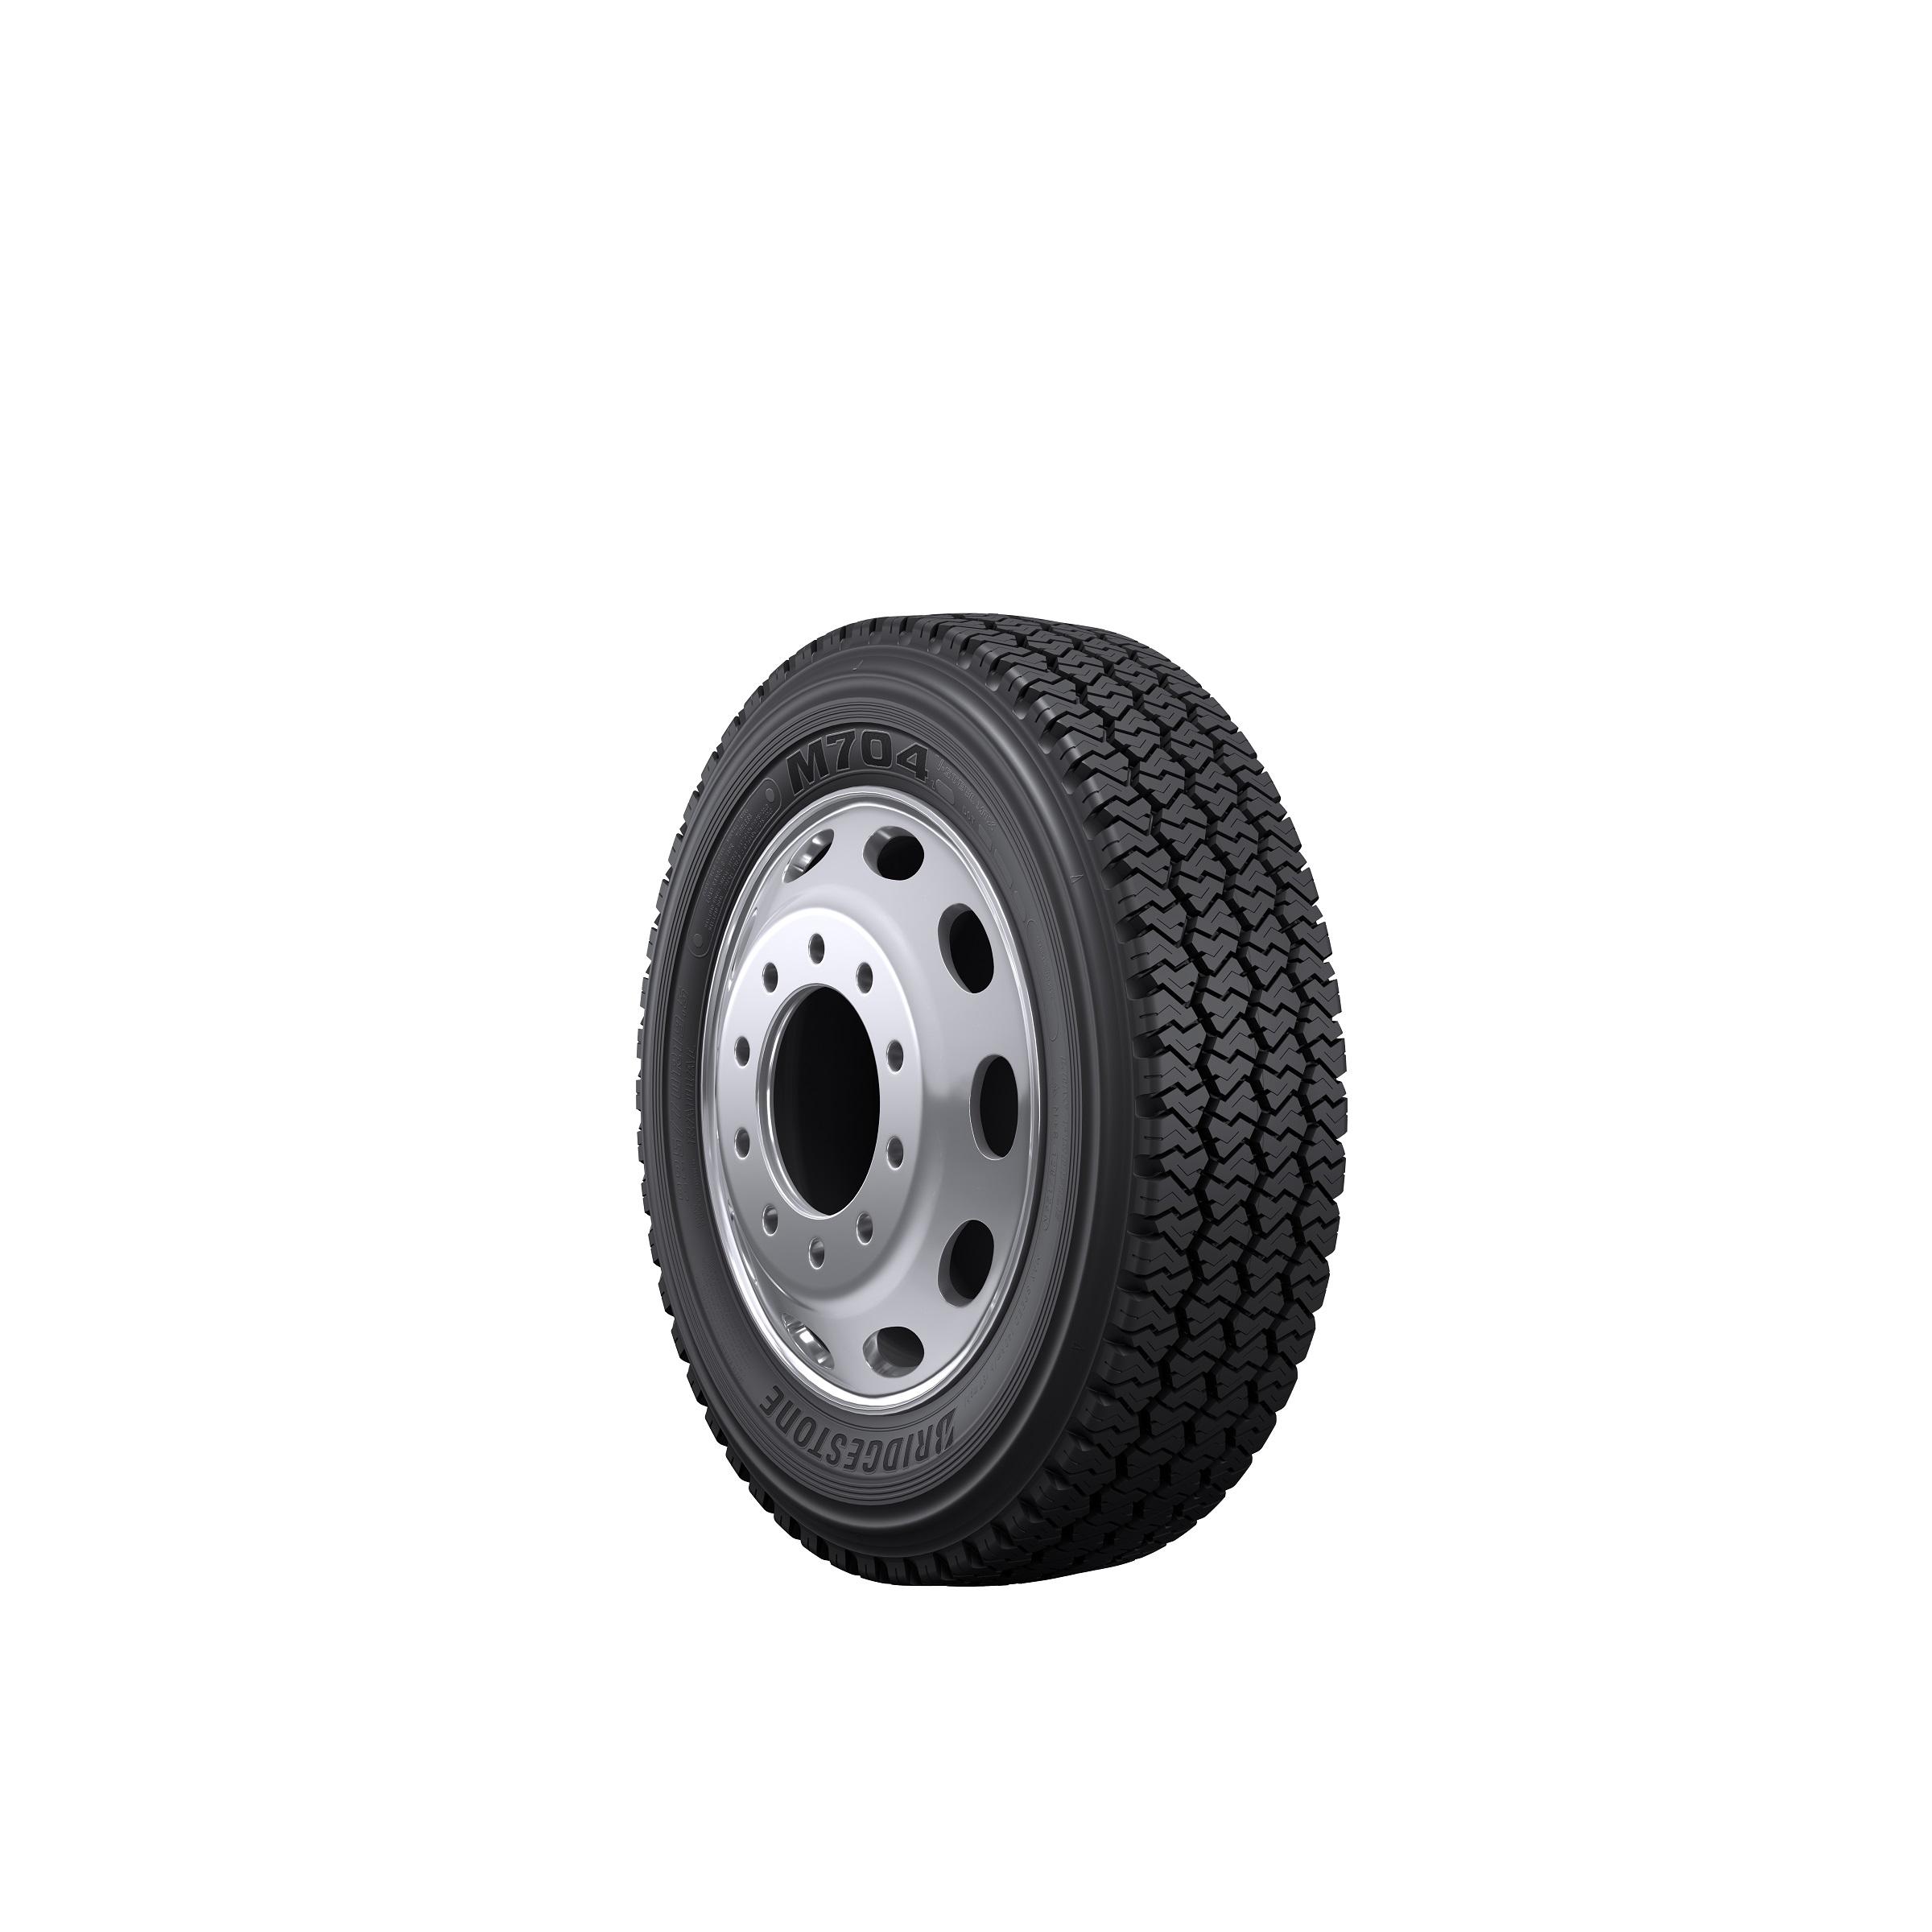 Bridgestone Expands Regional Truck Tire Lineup